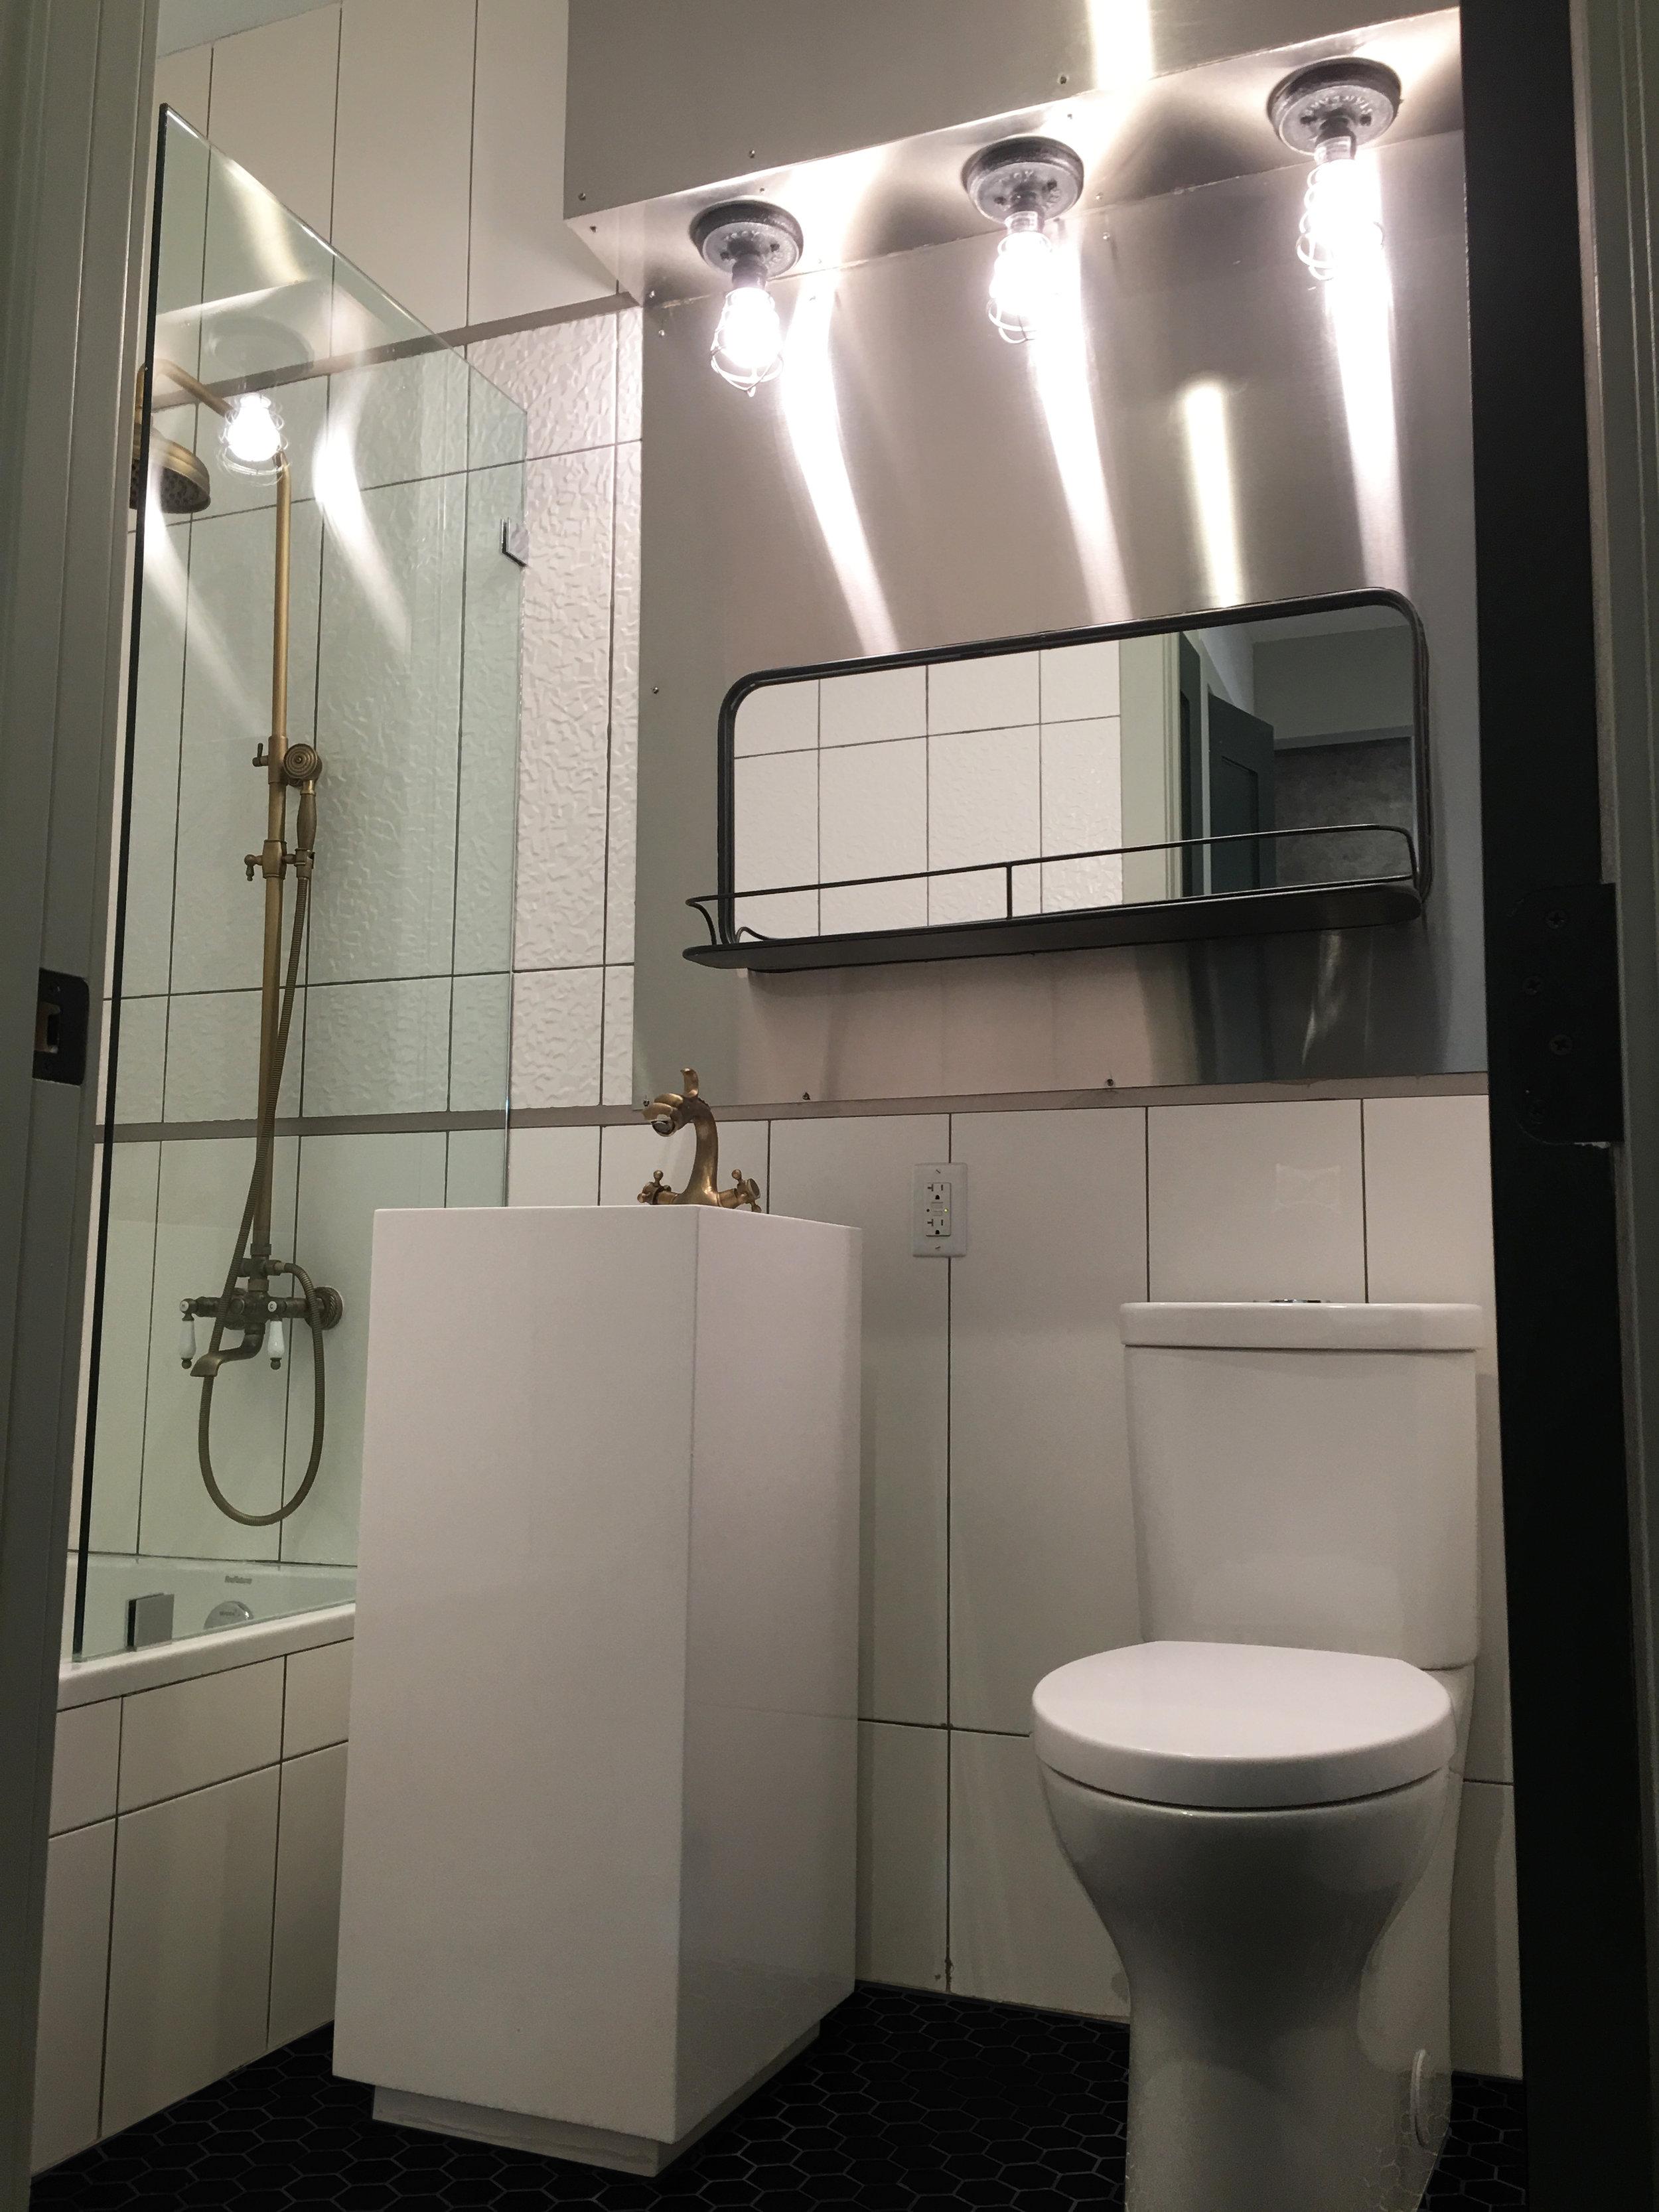 Scholes_St_102_Bk-Bath_1.jpg